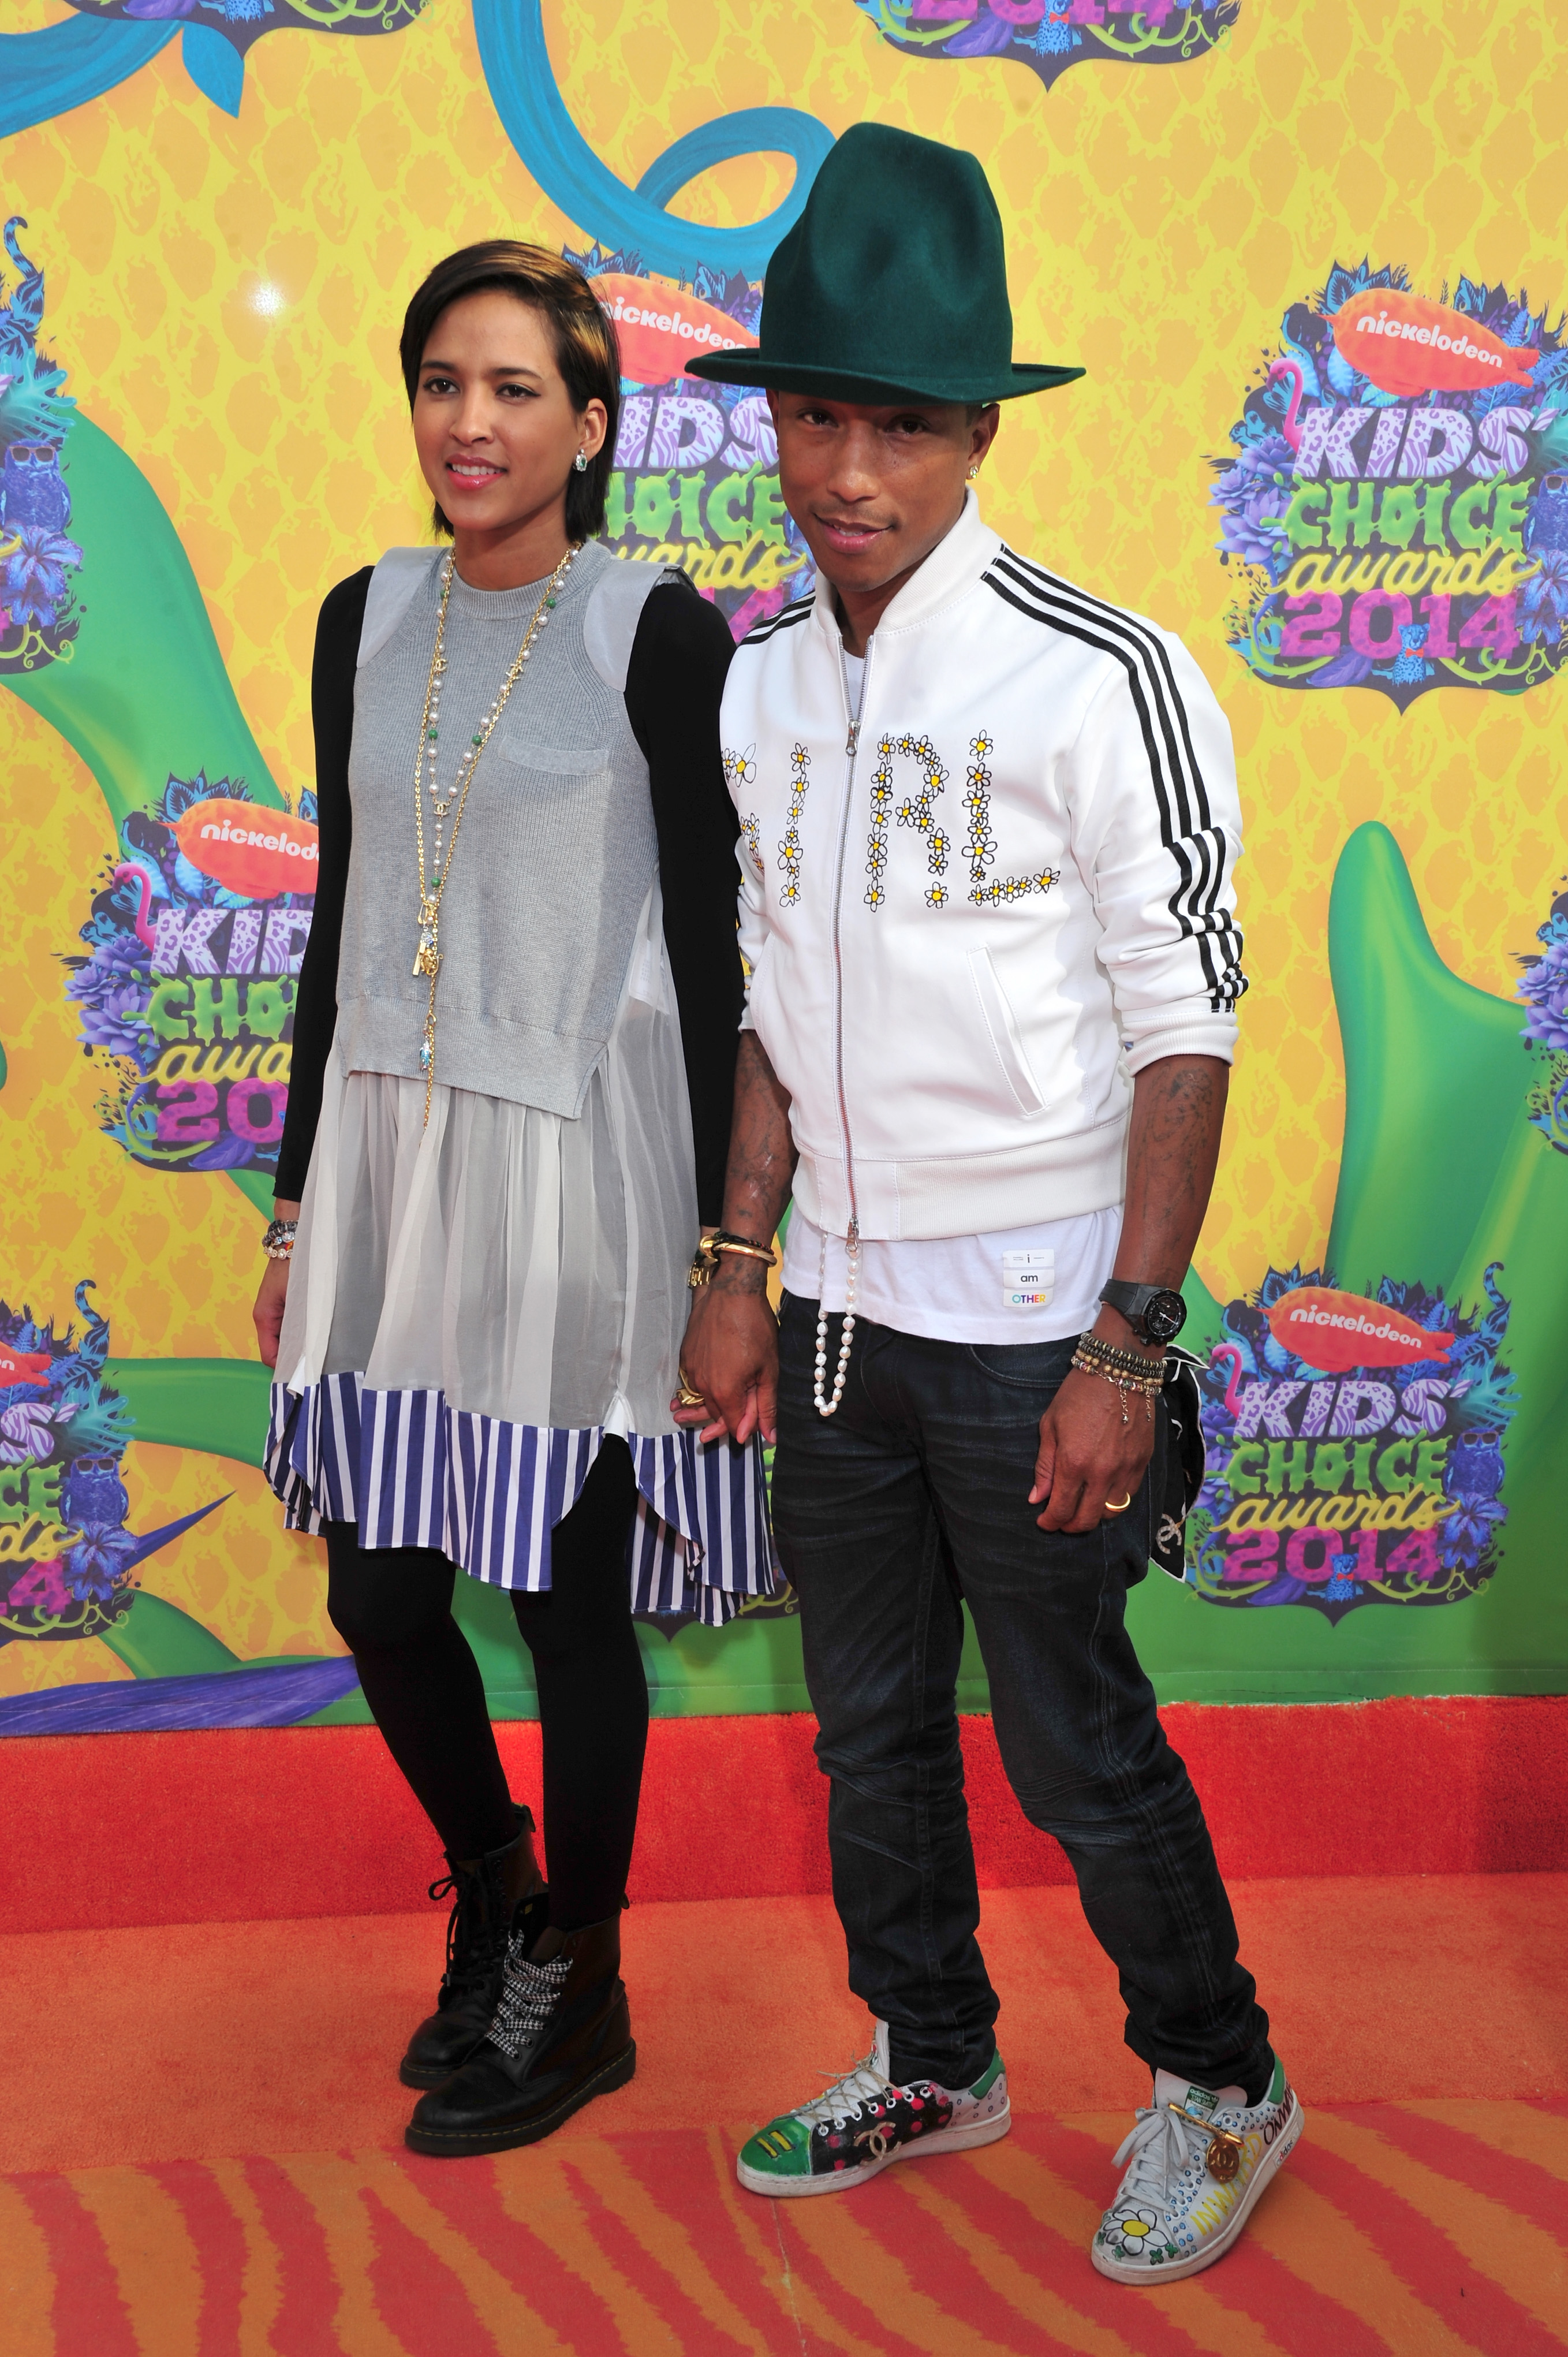 Pharrell Williams Wife Helen Lasichanh: Age, Son, Photos ...